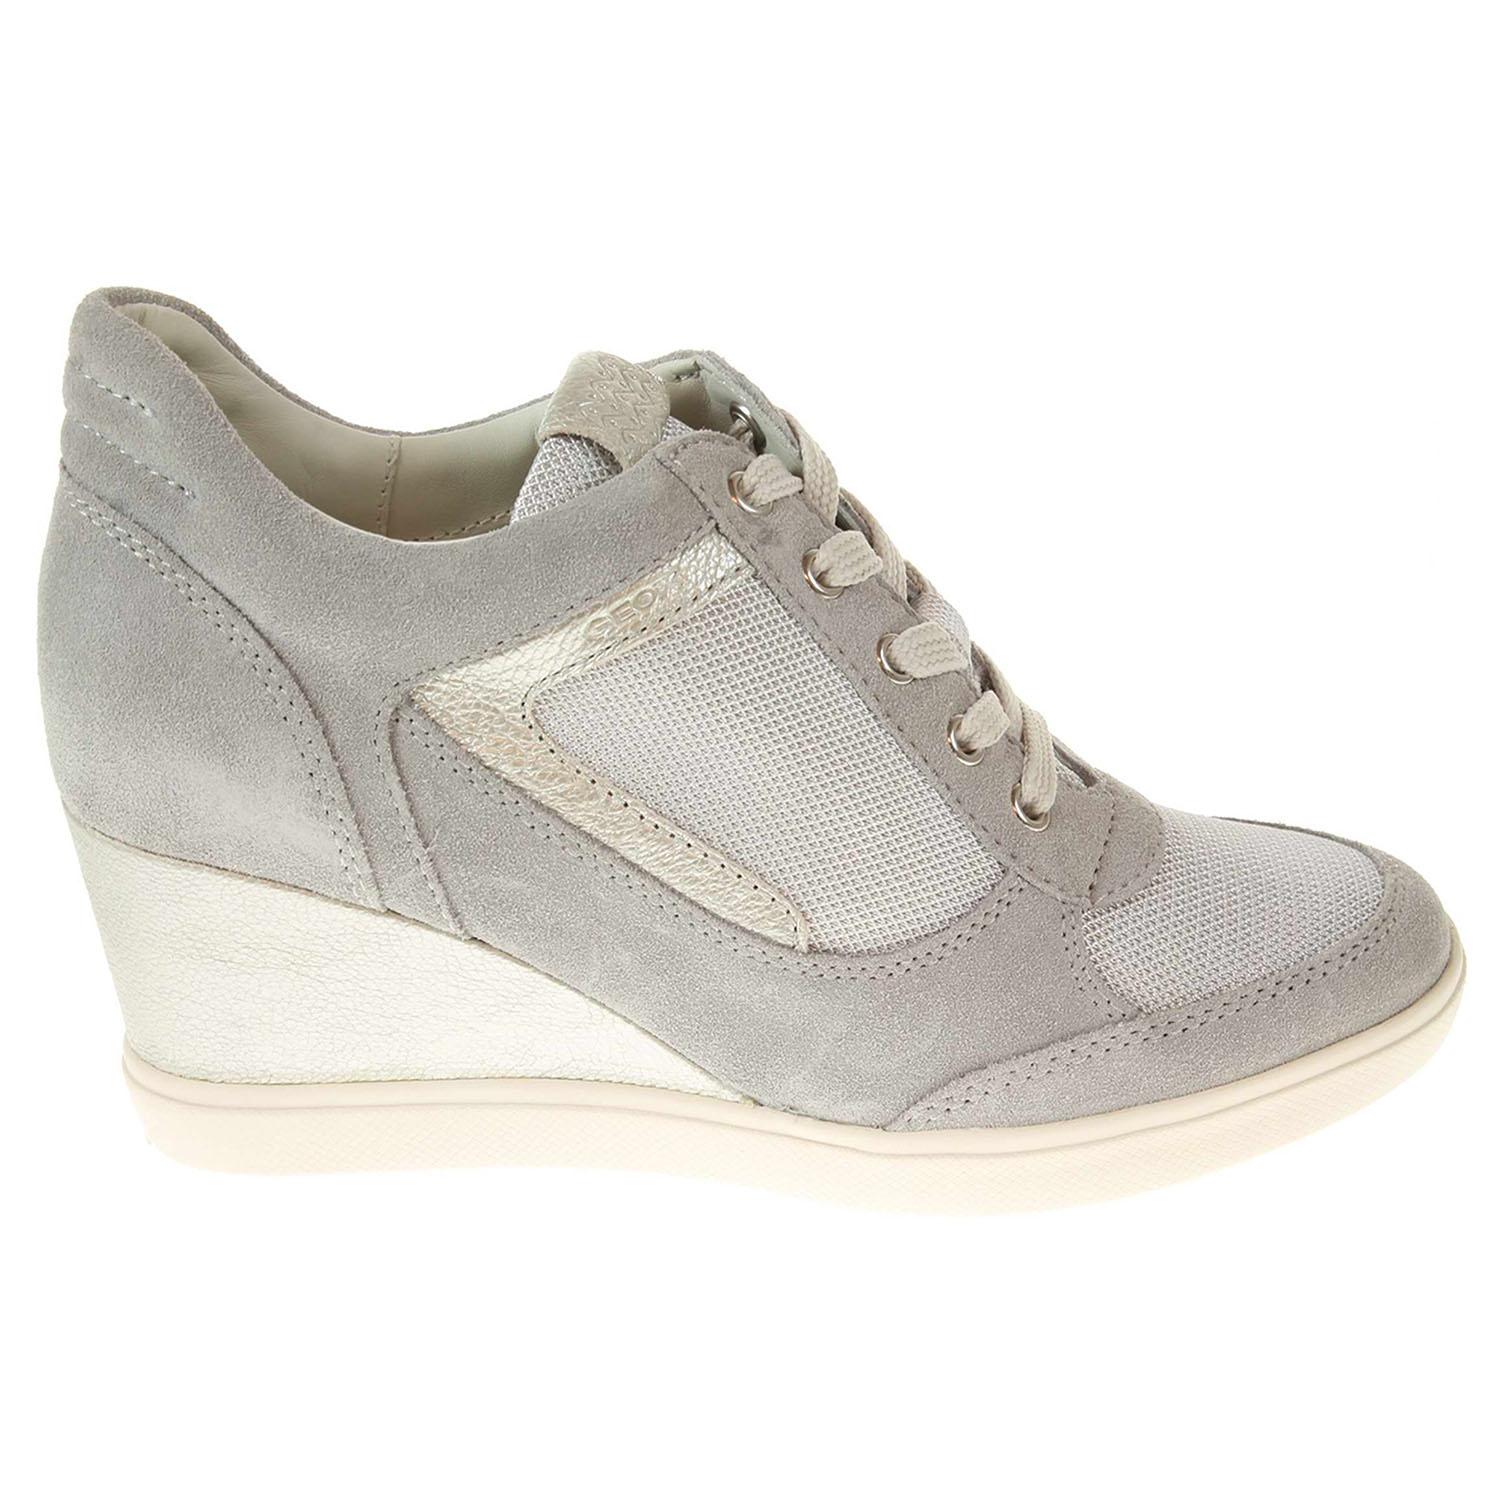 Geox Eleni dámská obuv stříbrná 40